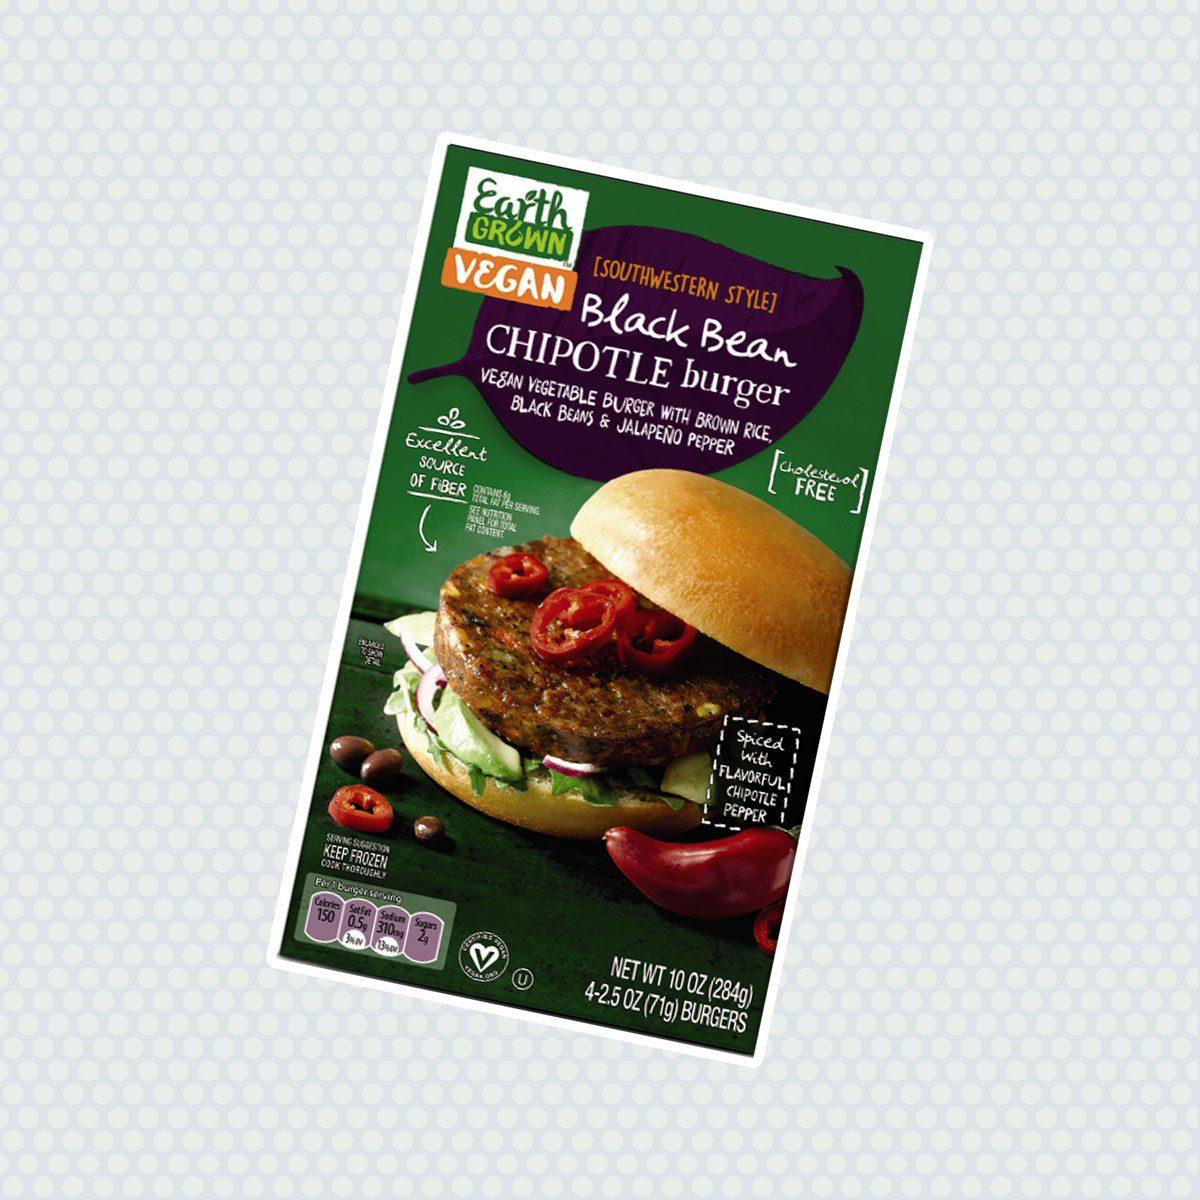 Earth Grown Veggie Burgers